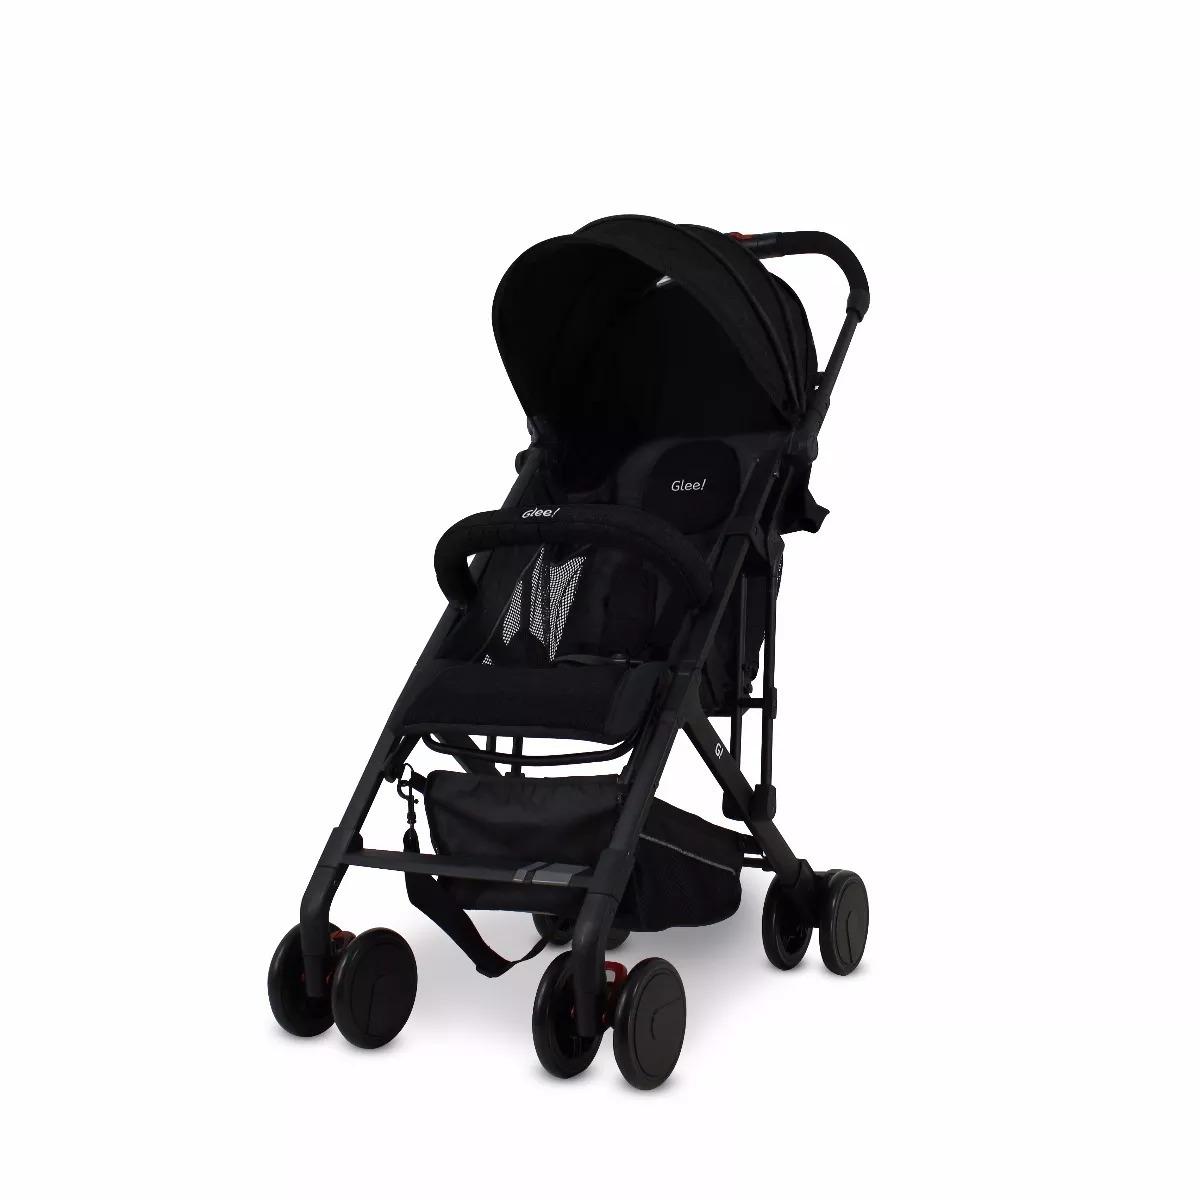 434523265 cochecito de bebe glee a19 plegable ultraliviano aluminio. Cargando zoom.